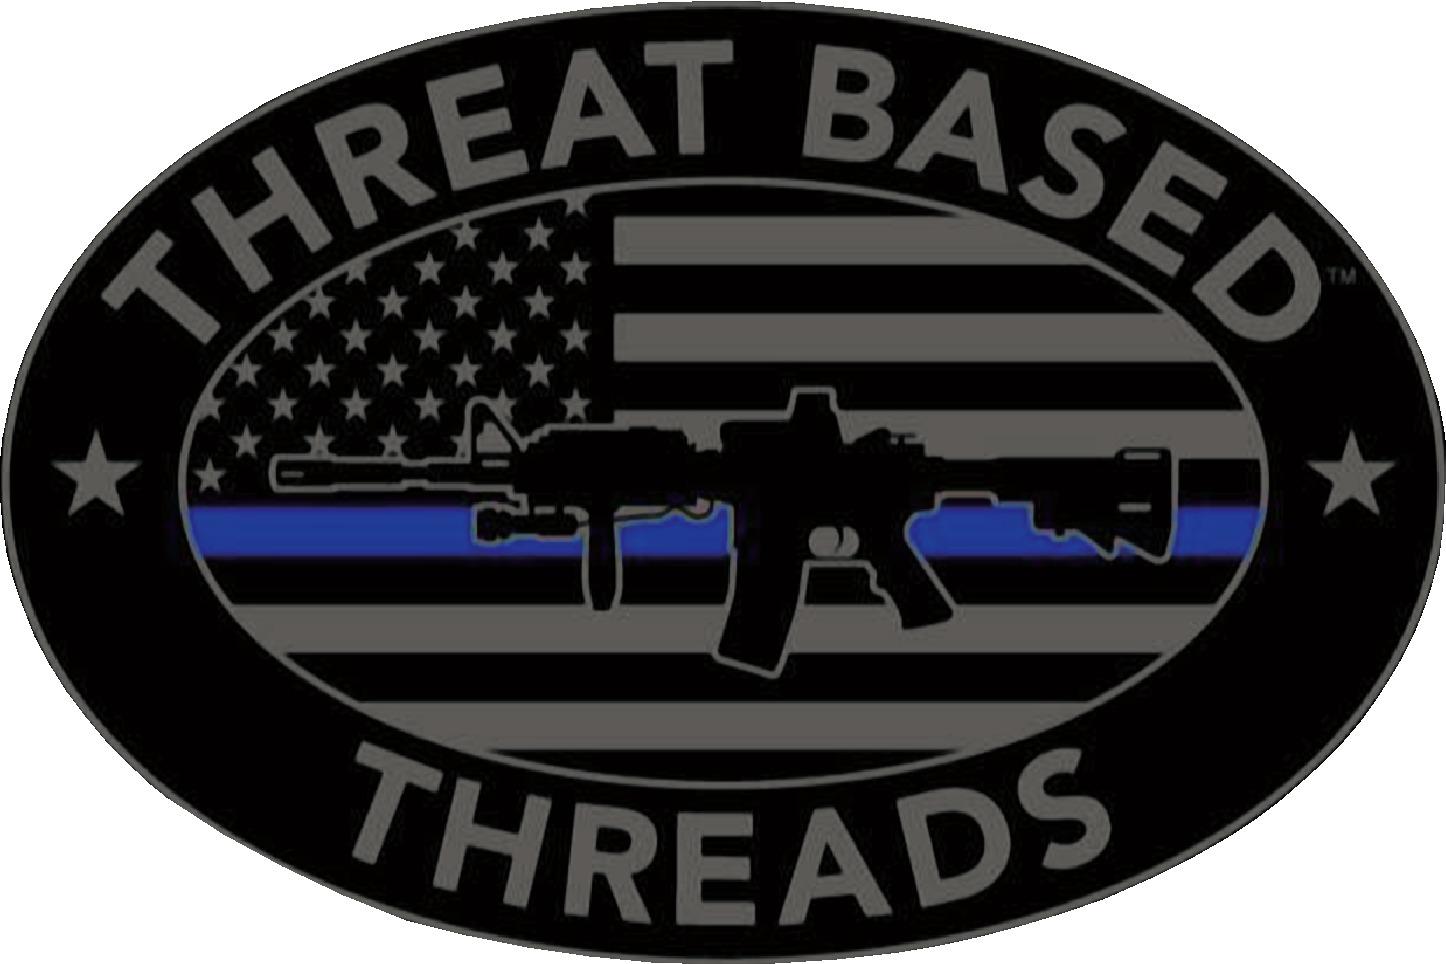 Threat Based